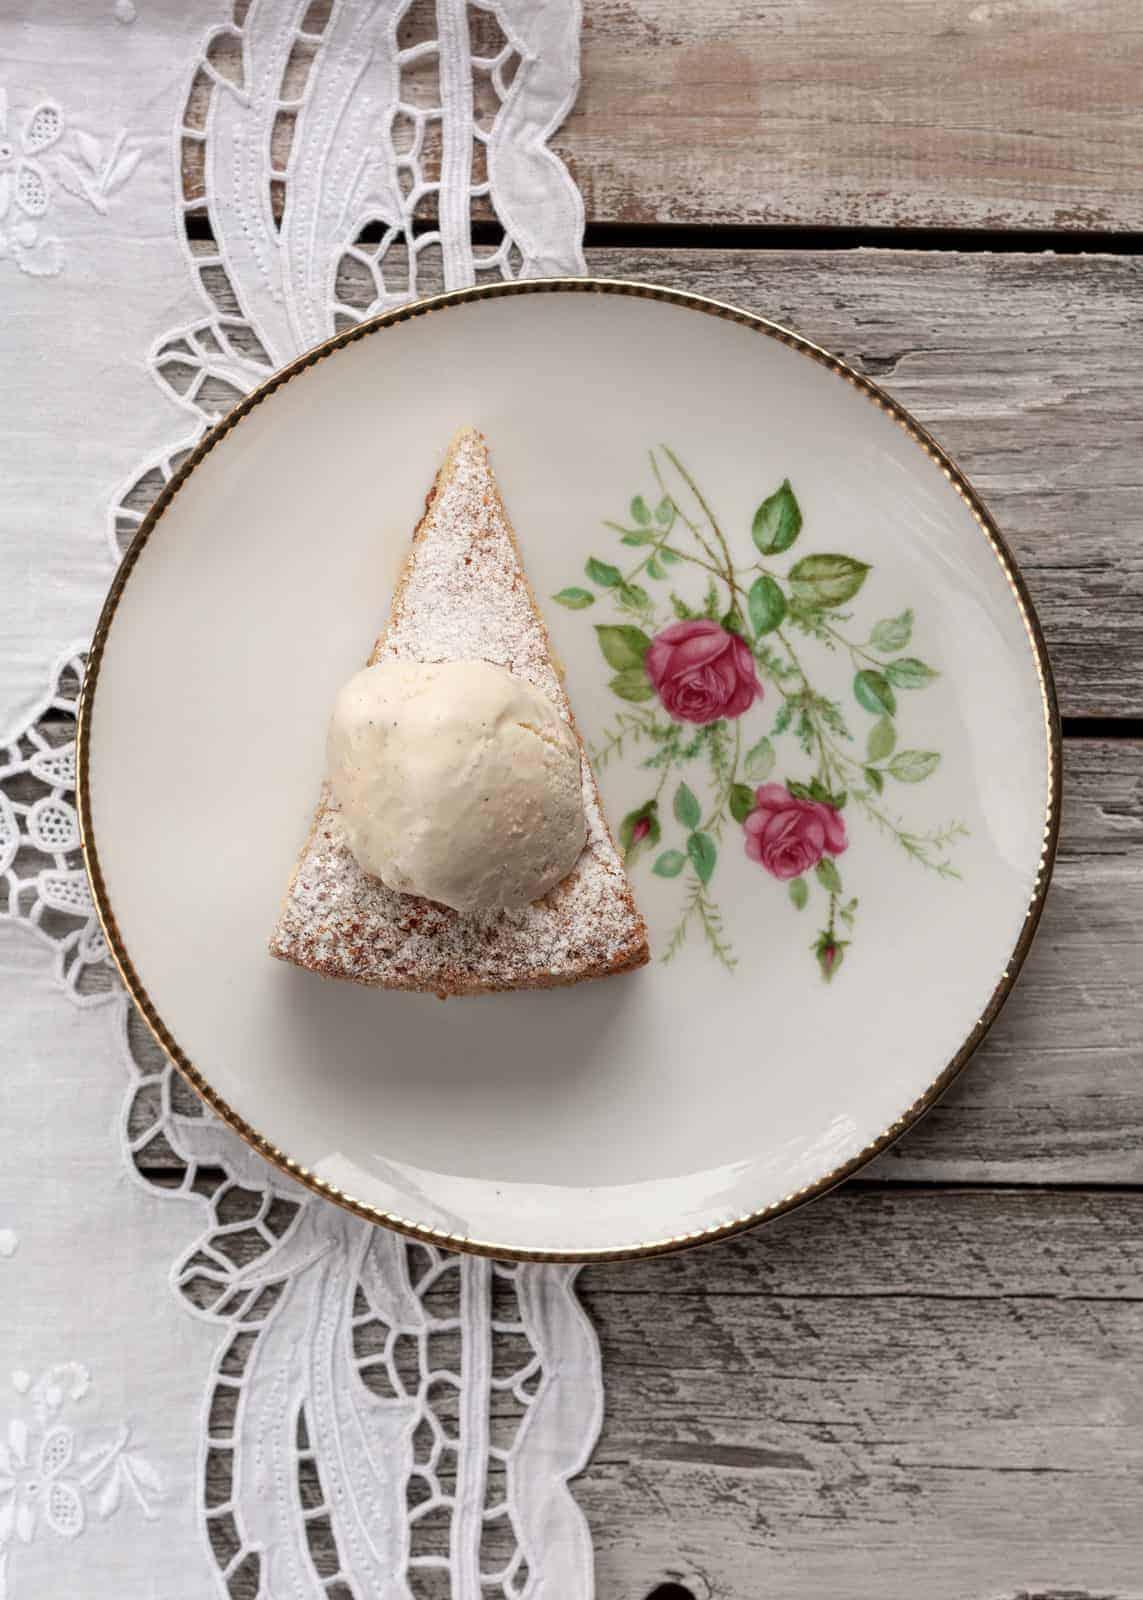 A heaven cake – Torta Paradiso